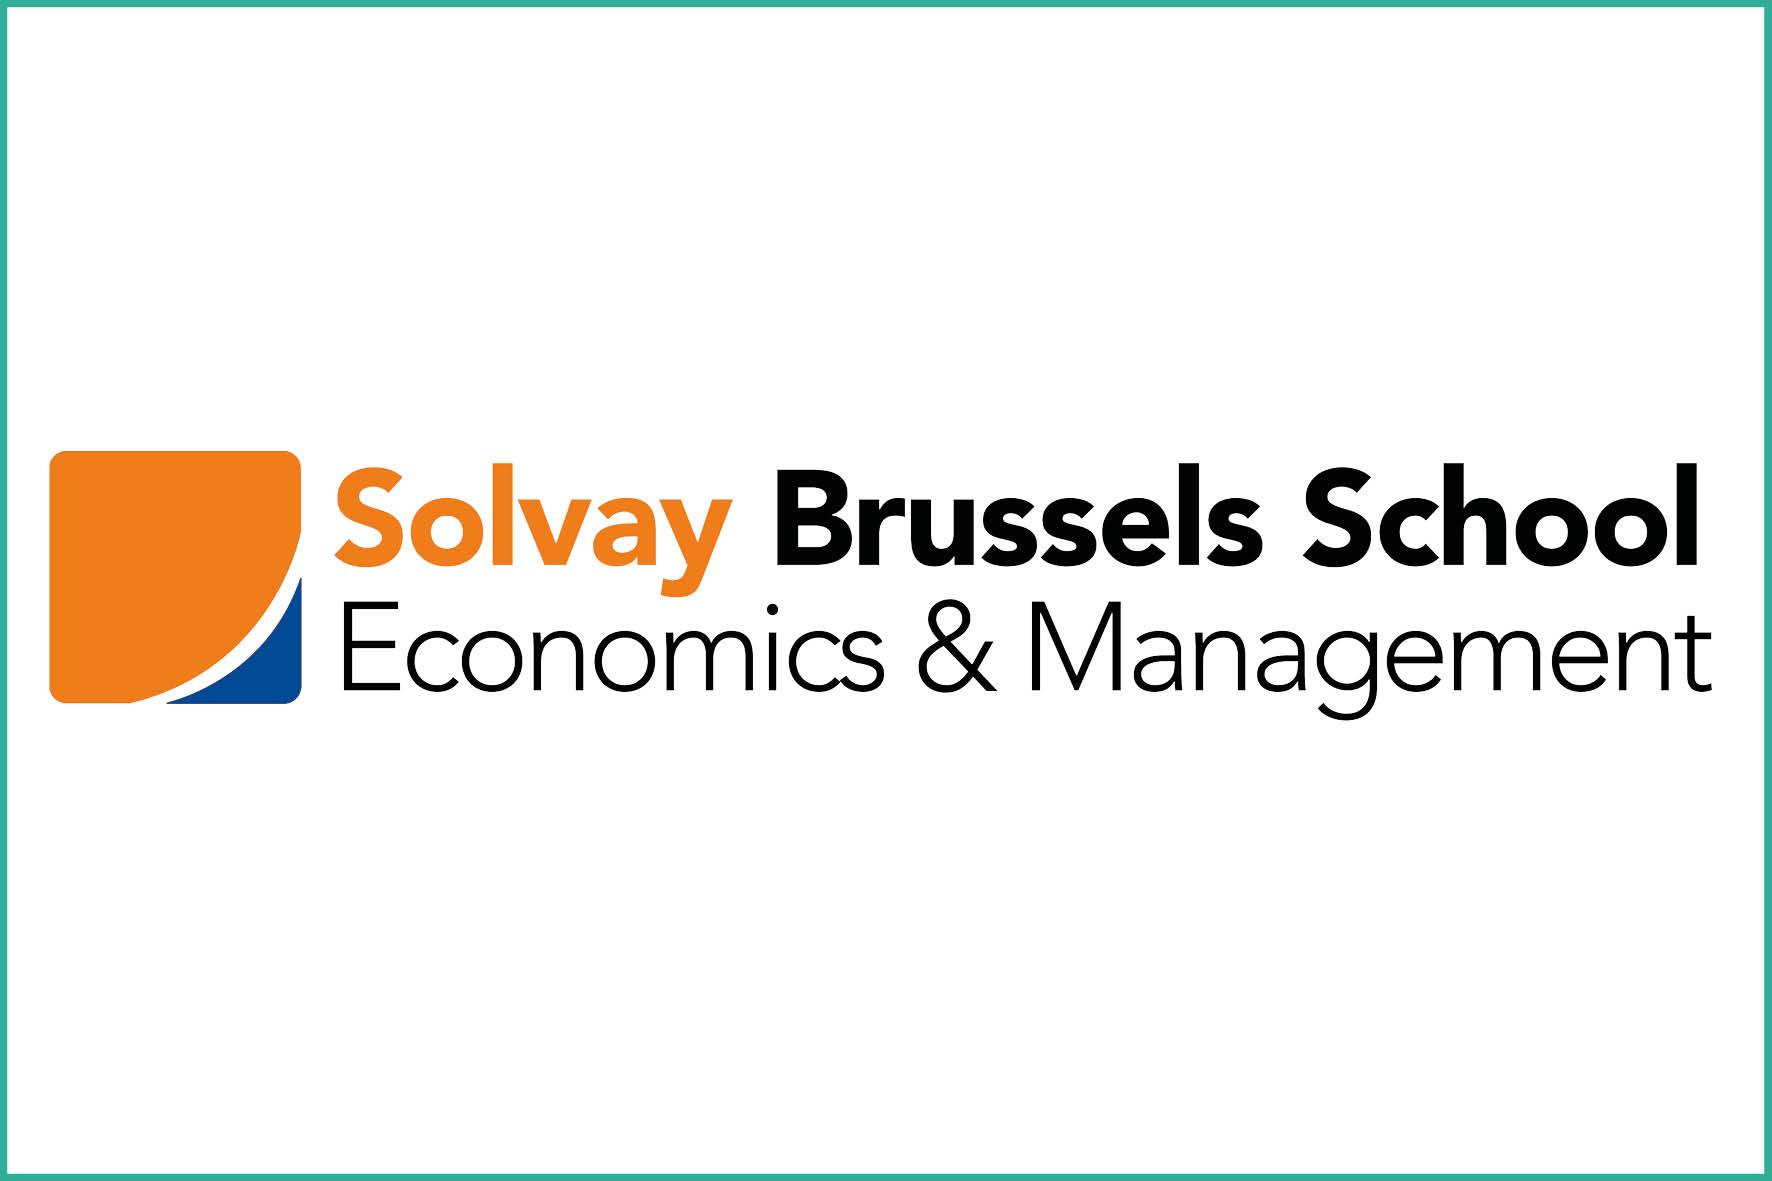 bcc-solvay-brussels-school